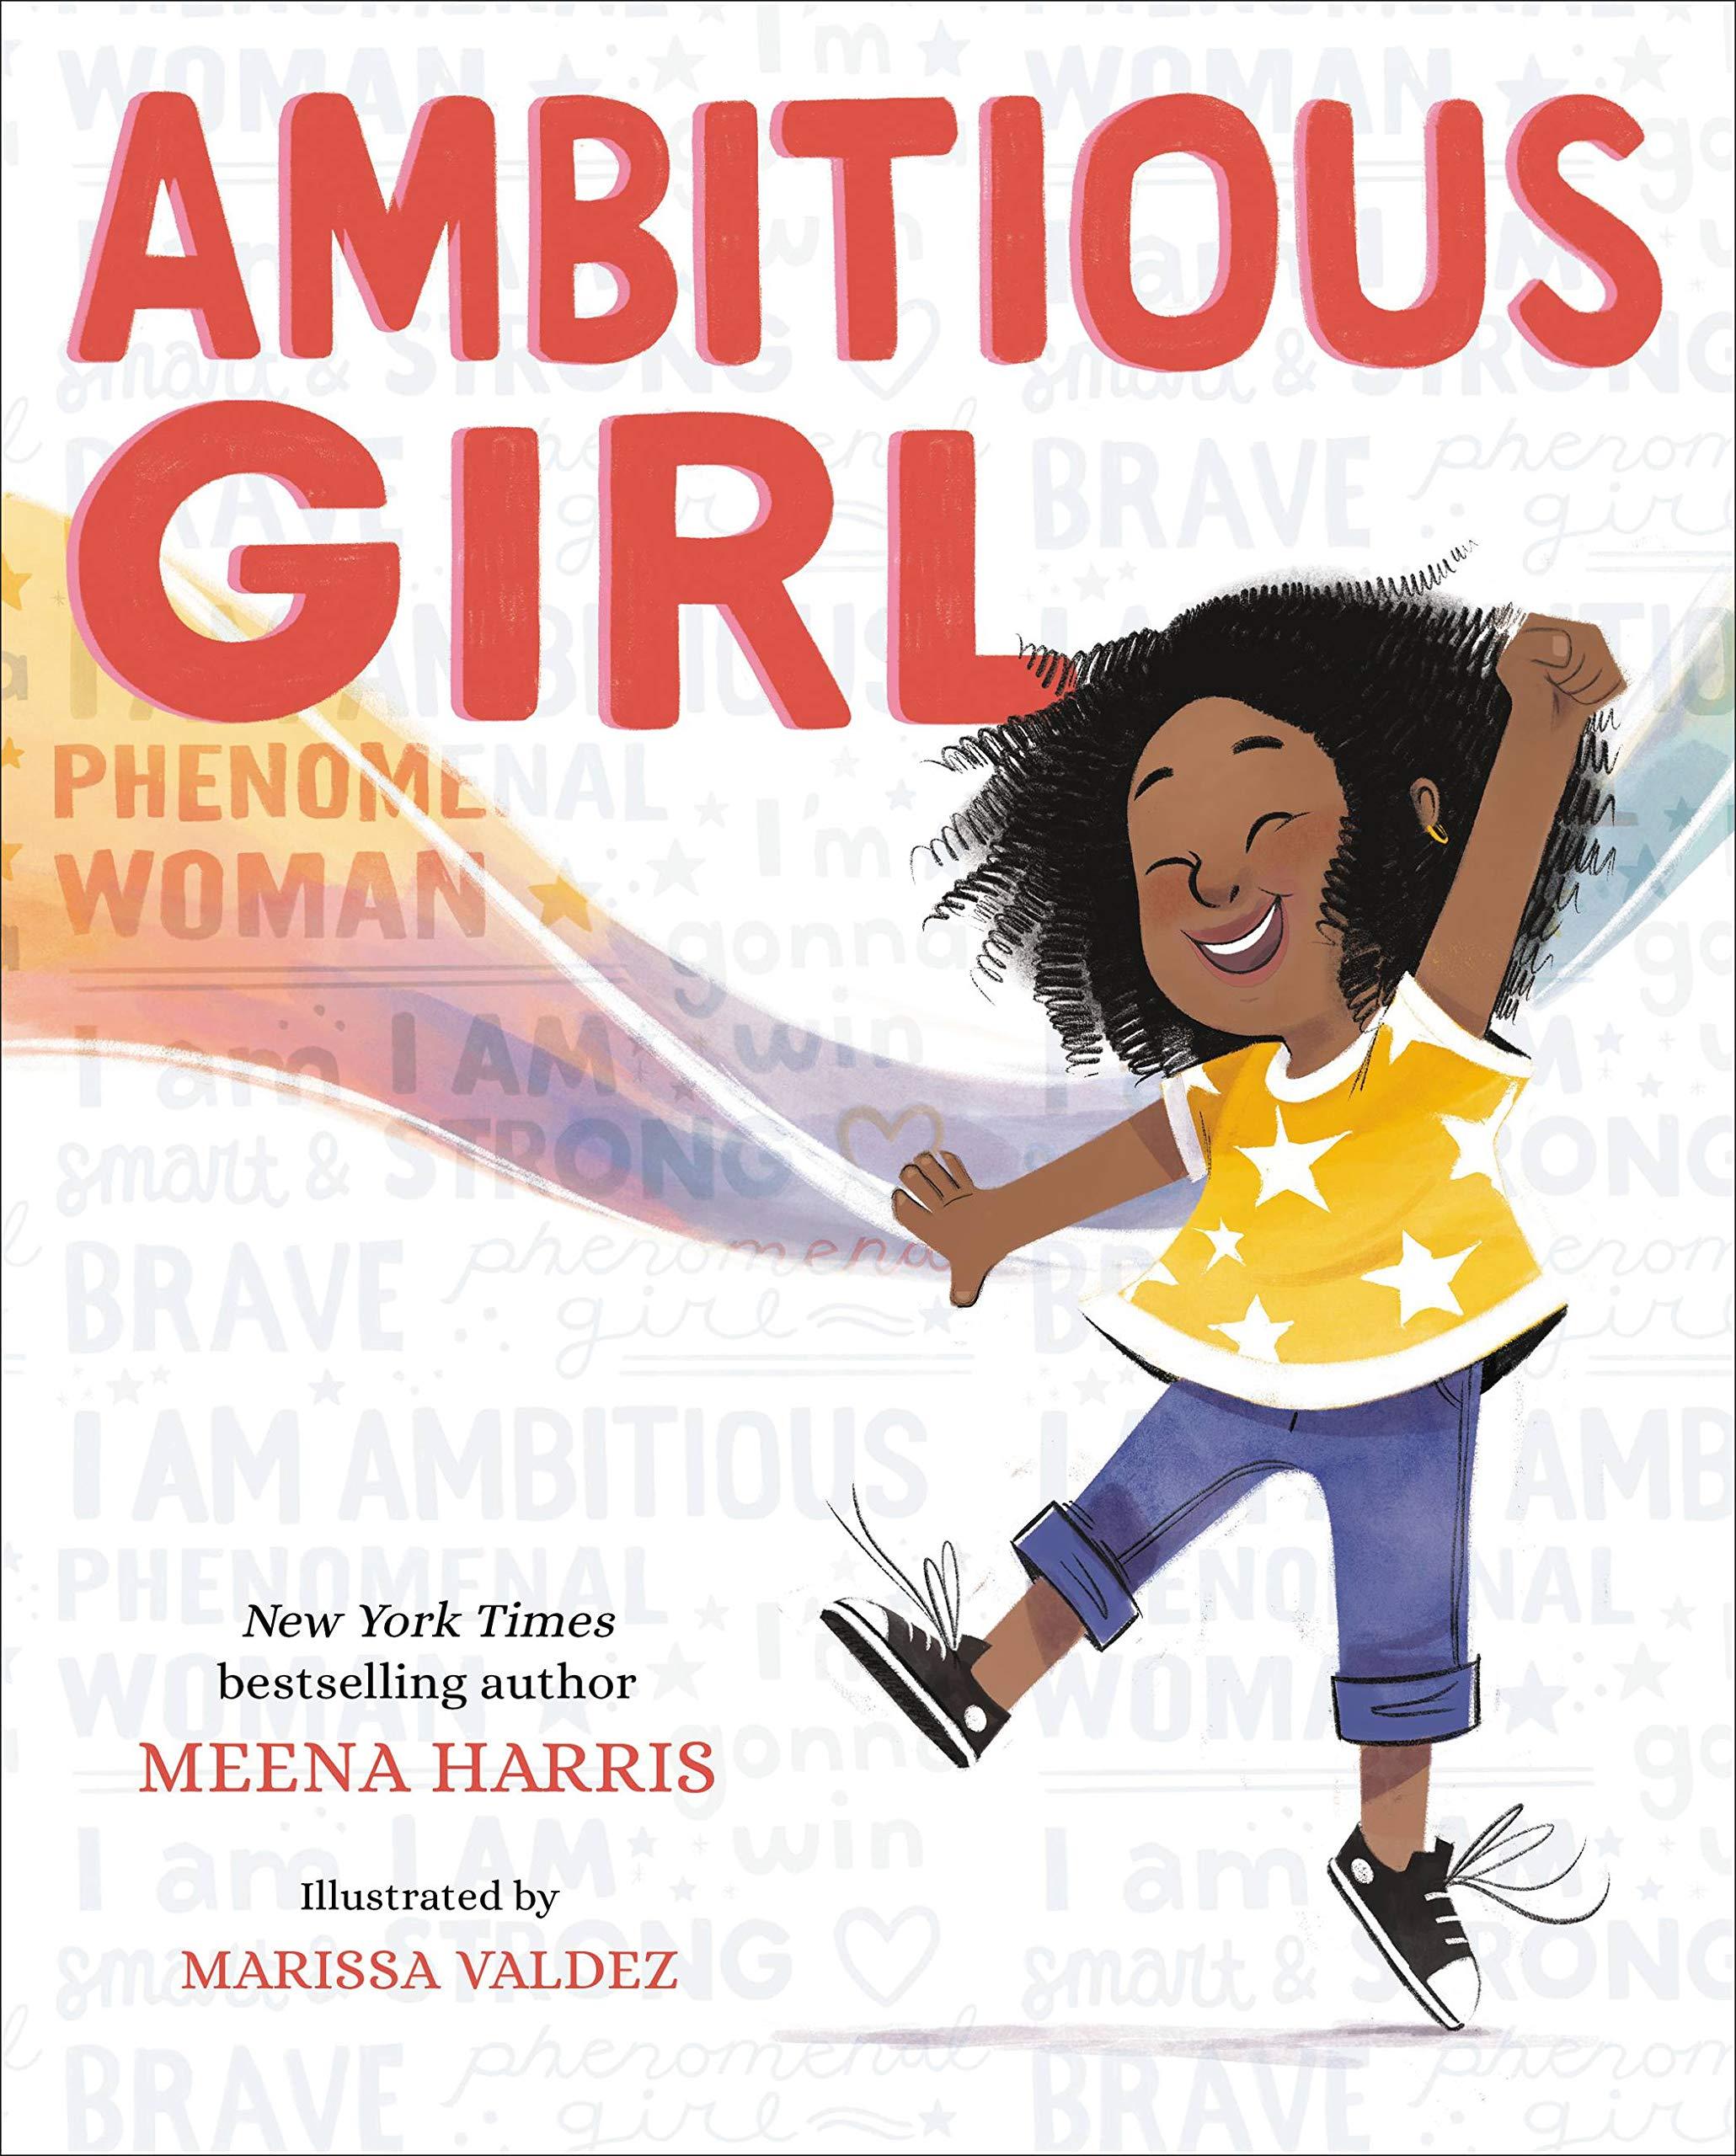 Ambitious Girl: Harris, Meena, Valdez, Marissa: 9780316229692: Amazon.com:  Books